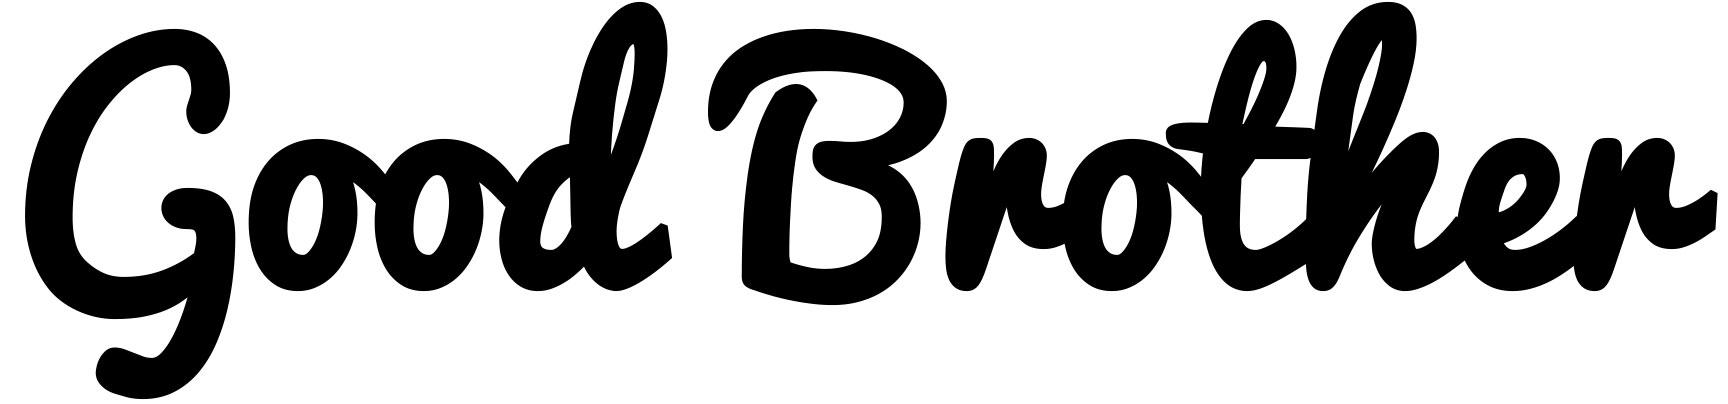 Good-Brother-Logo.jpg